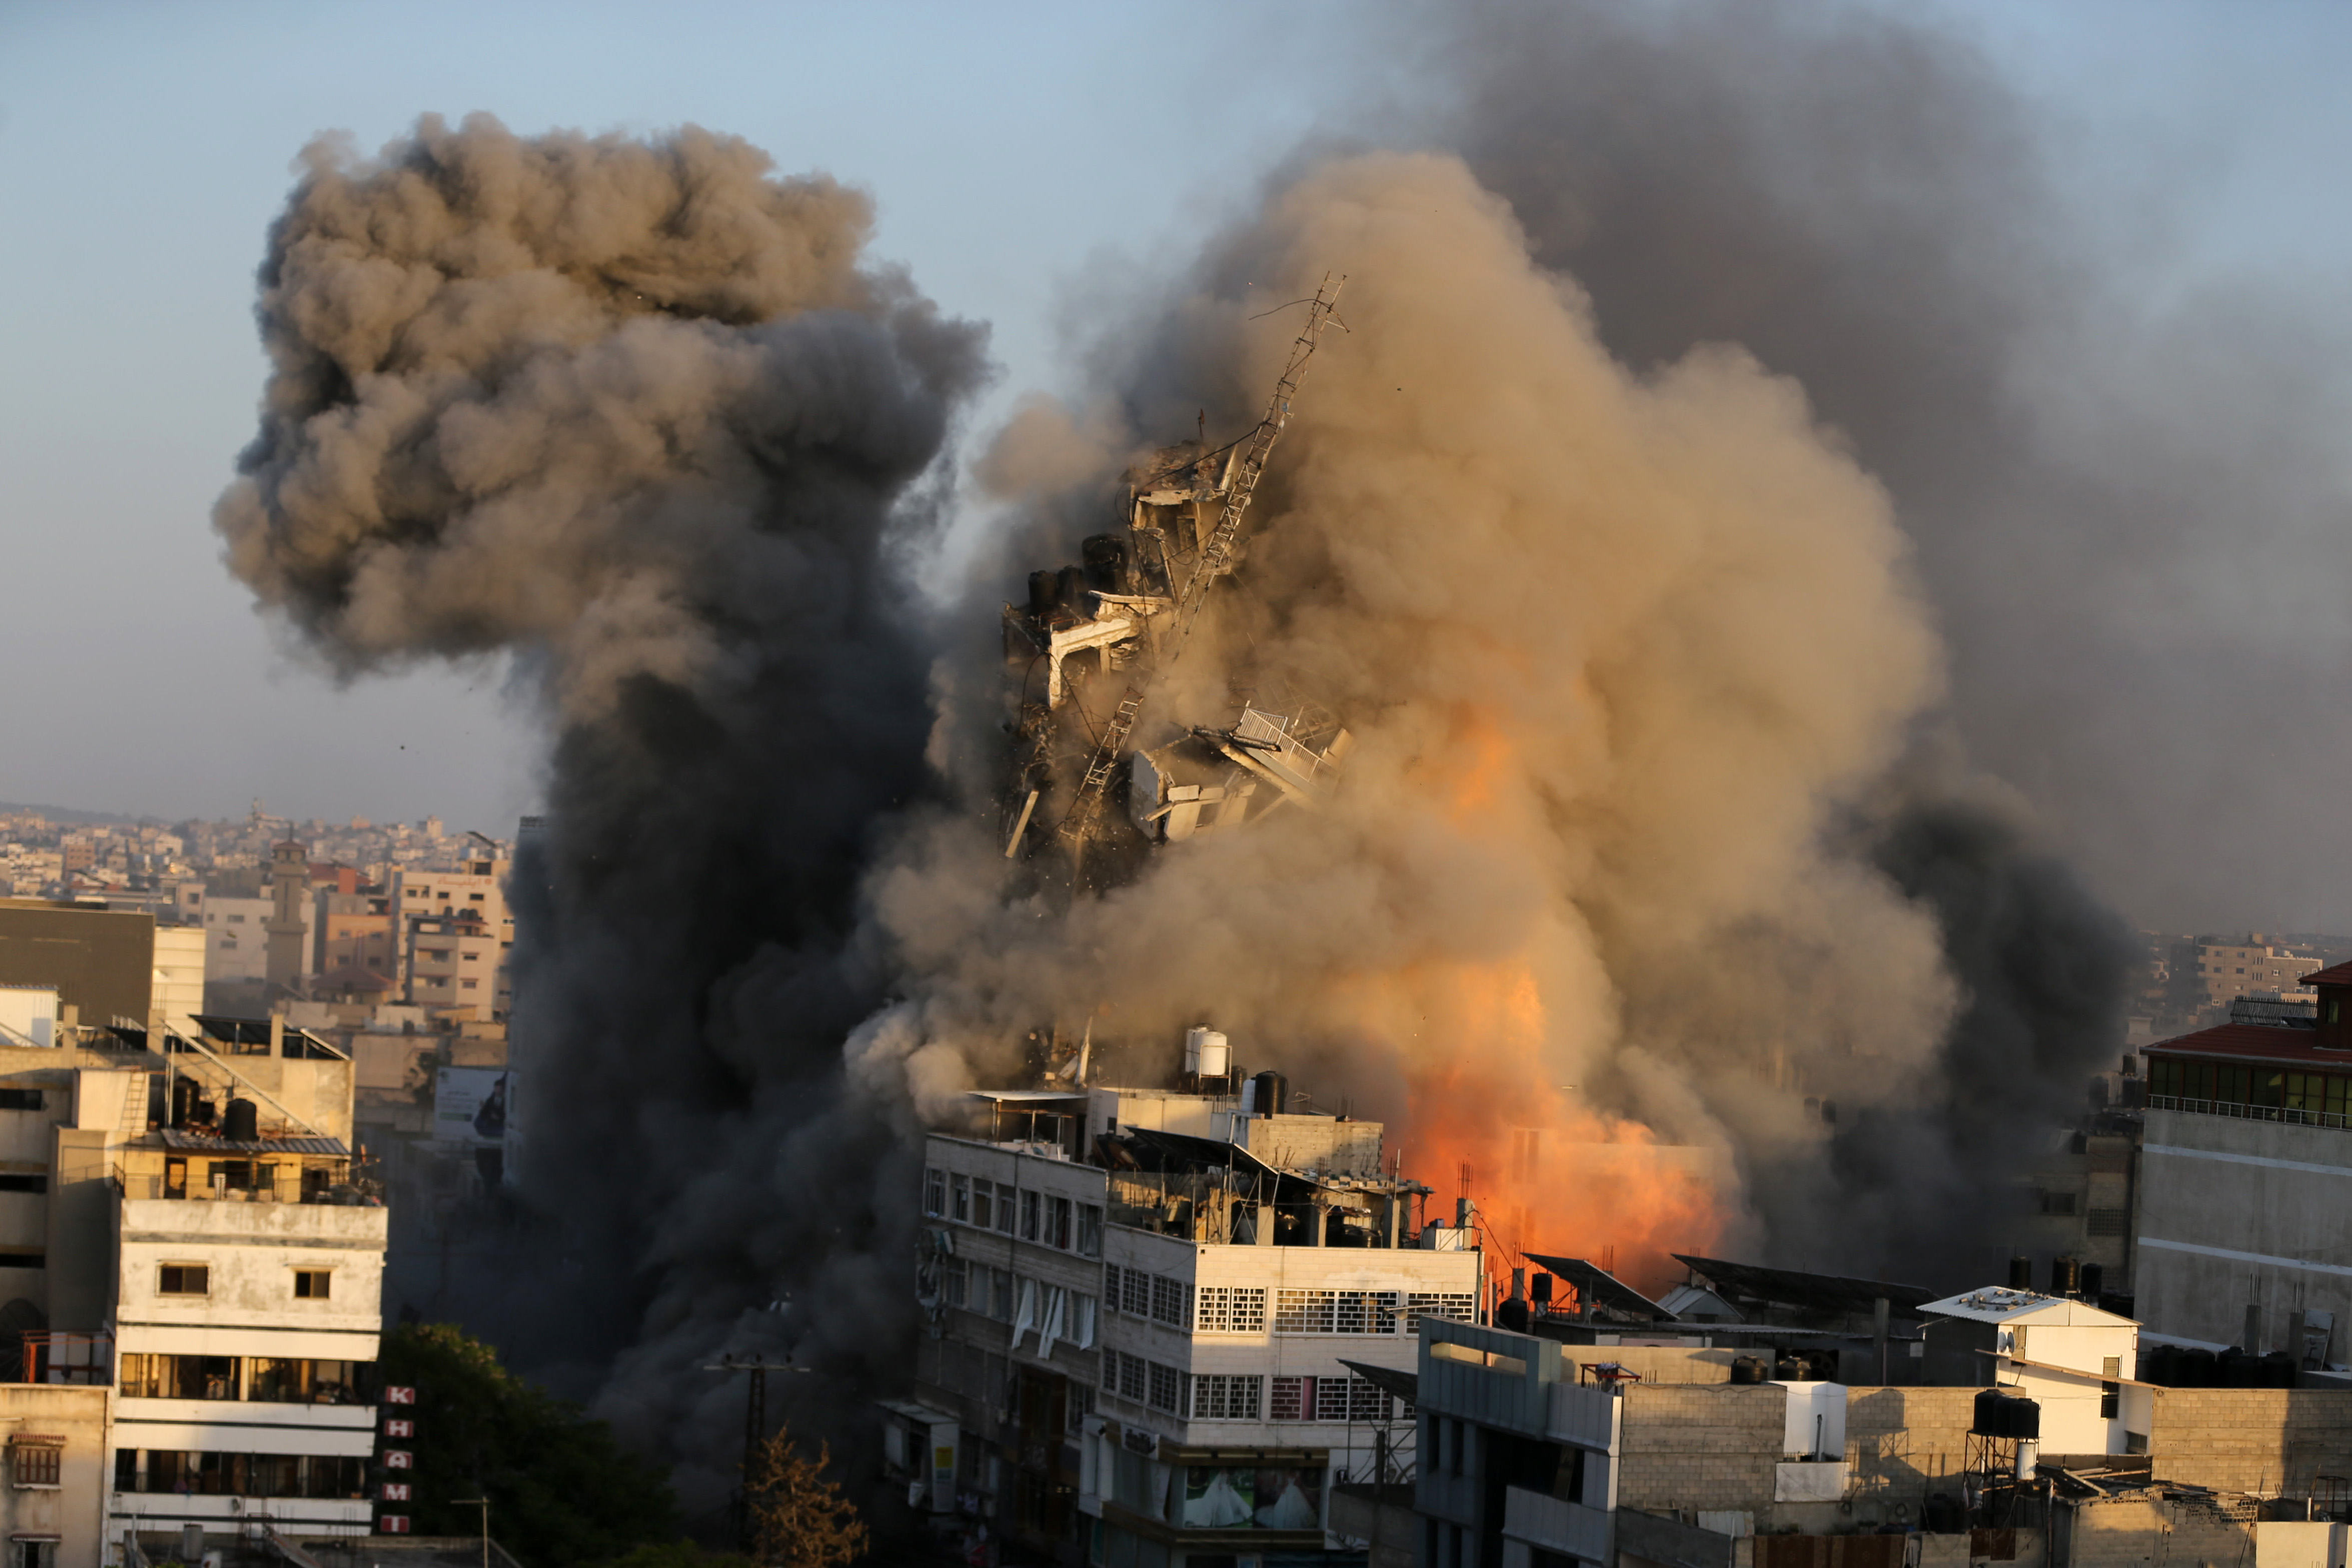 Israeli air strikes destroy buildings housing more than a dozen media outlets in Gaza